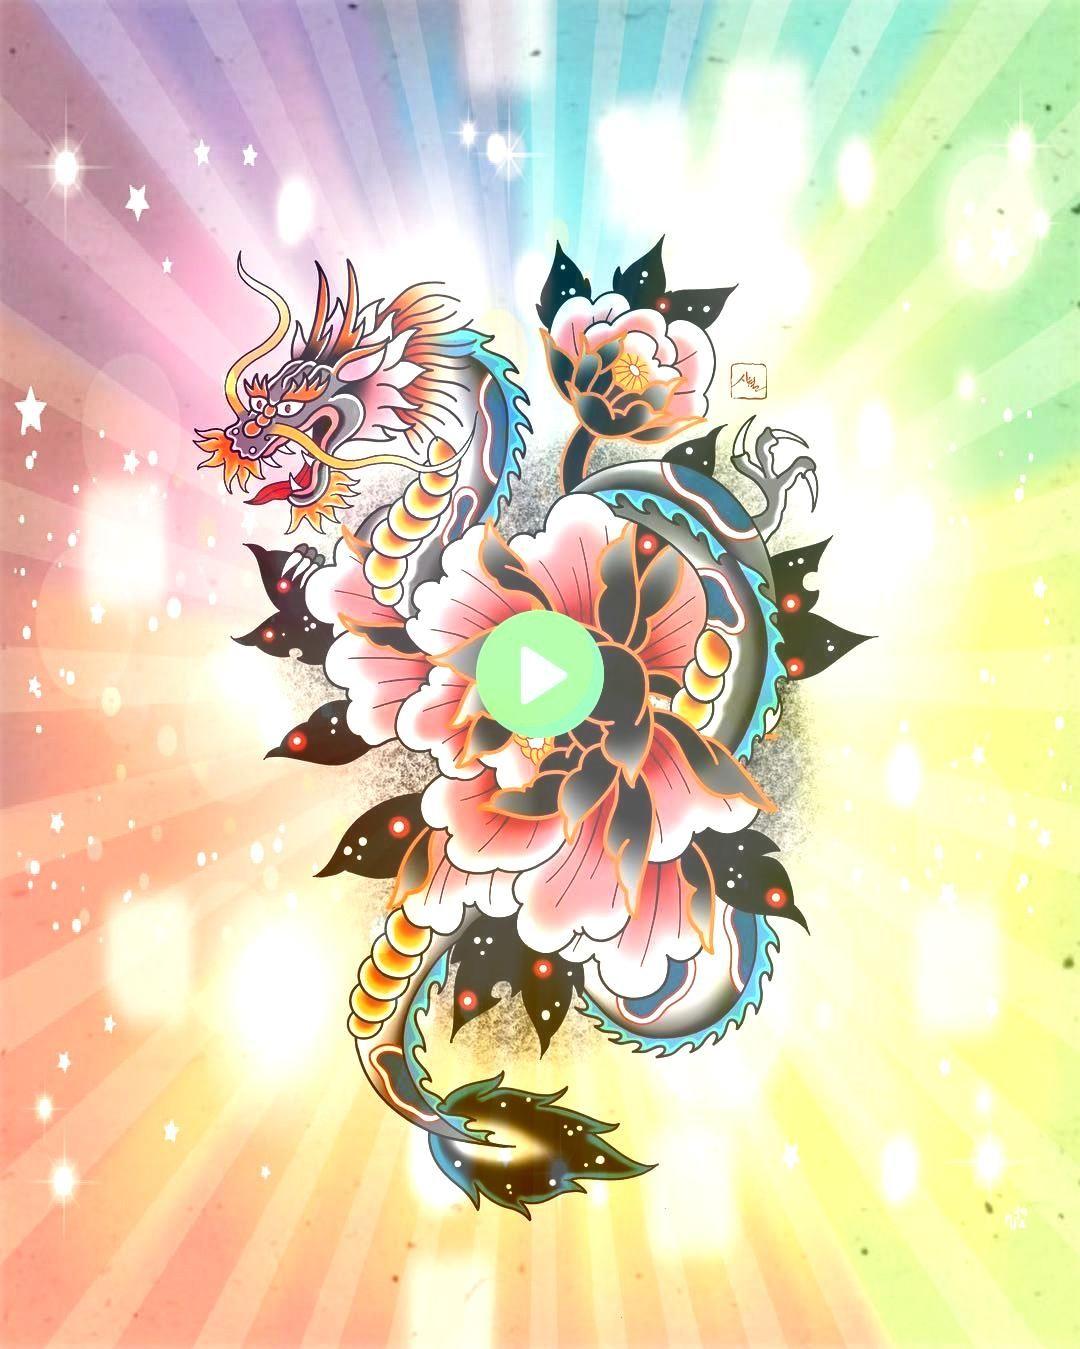 and dragon illustration  tattoo flash 시월  shiwol on Instagram  Peony and dragon illustration  tattoo flash 시월  shiwol on Instagram Peony and dragon illustration  tatt...